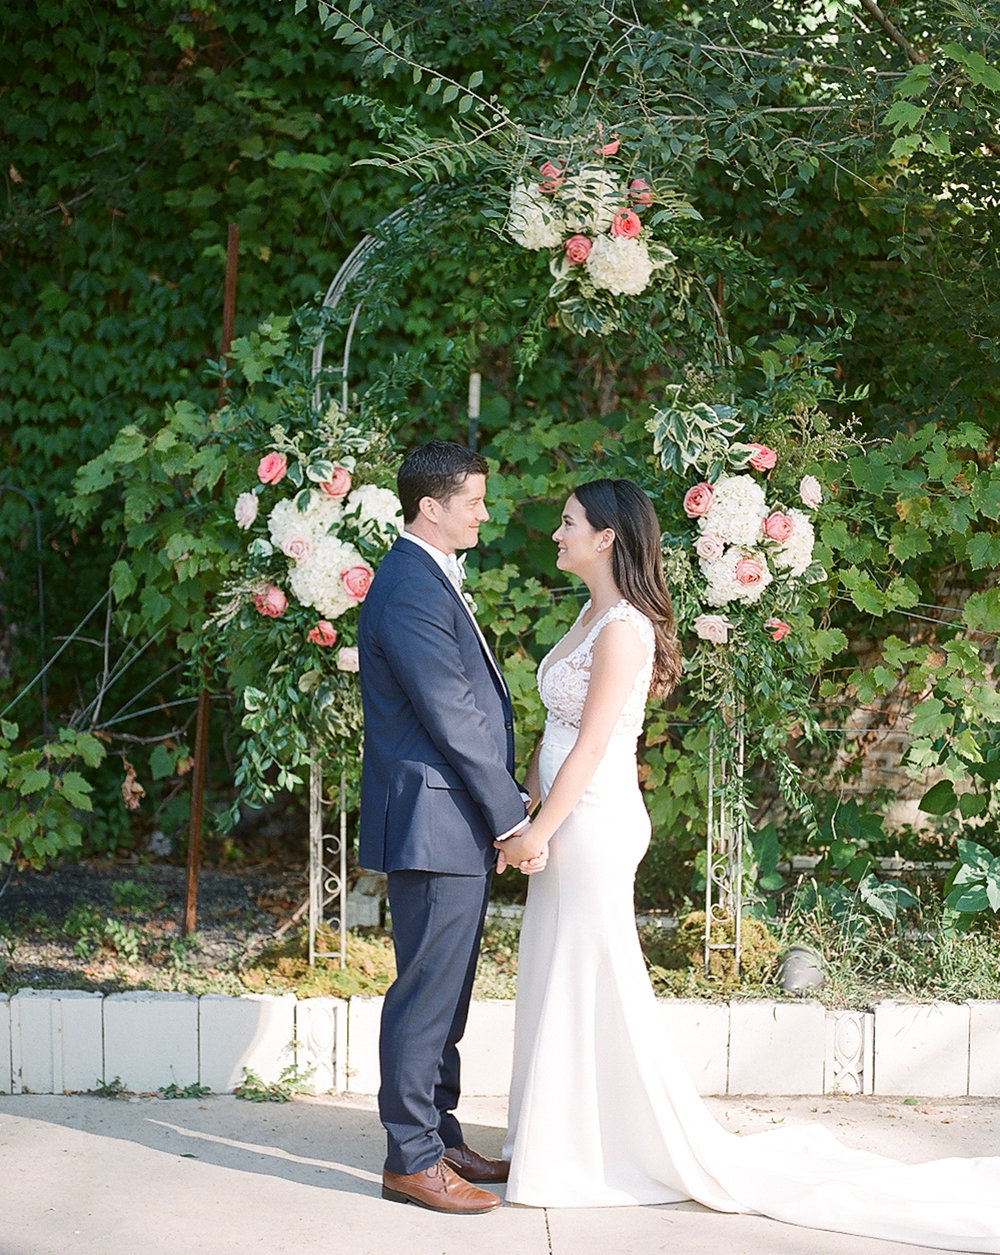 Bonphotage Chicago Fine Art Wedding Photography - City Winery